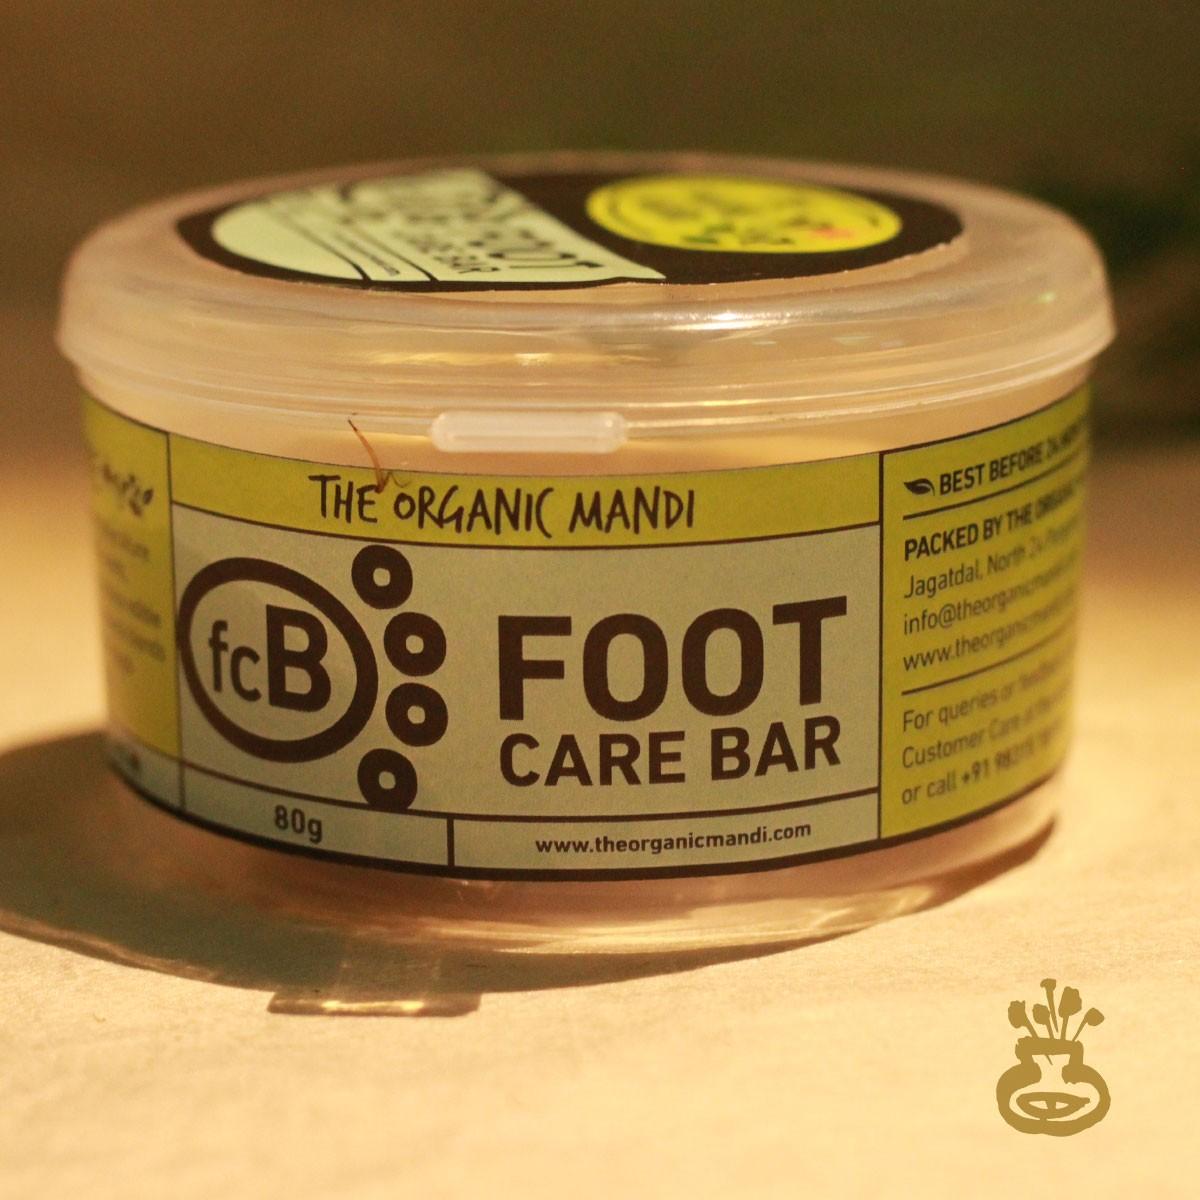 Foot Care Bar (80g)